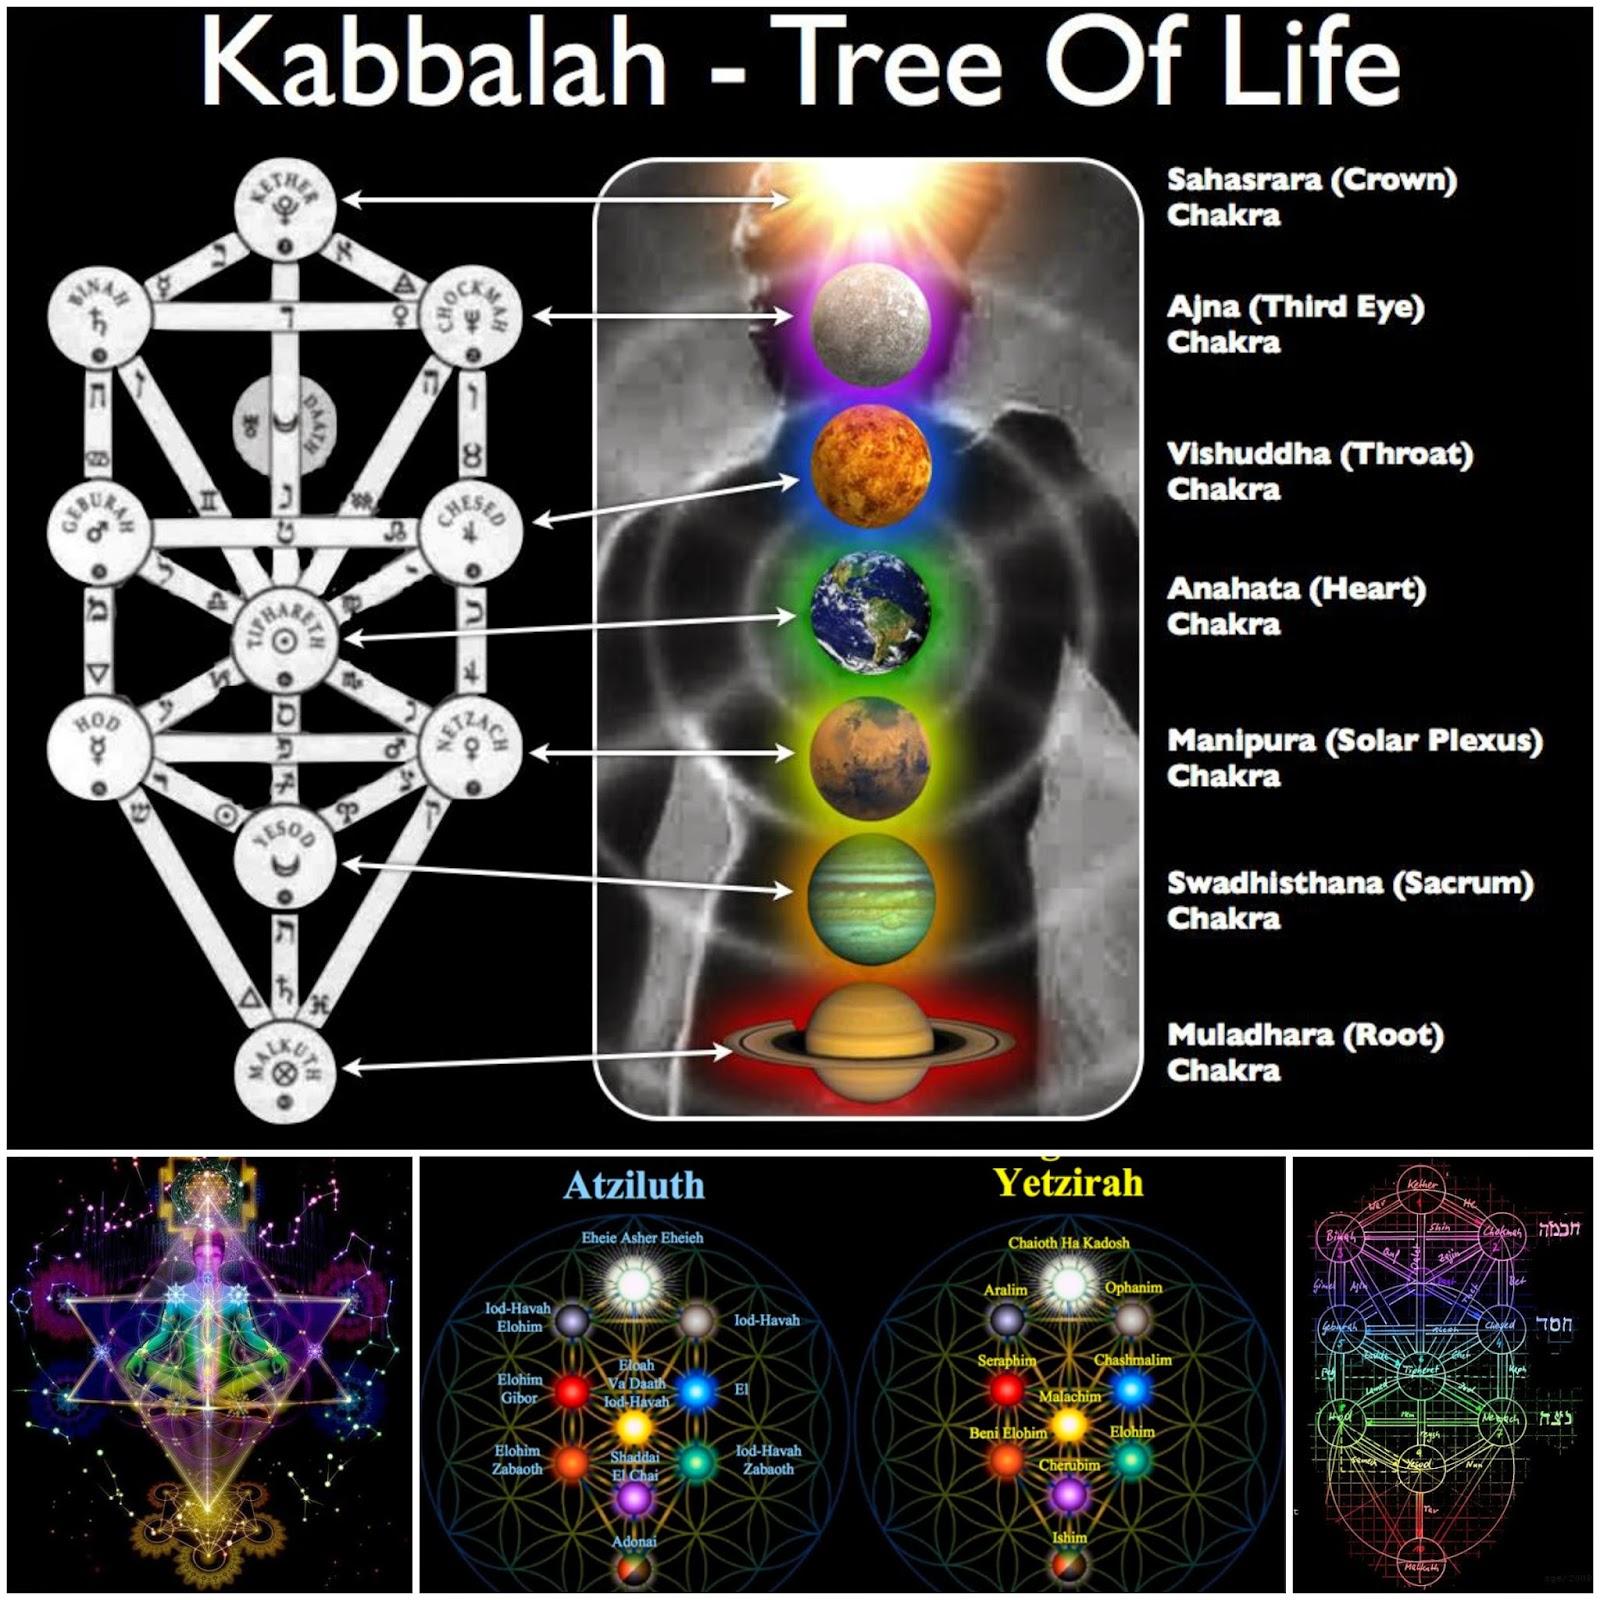 Relazioni, la kabbalah